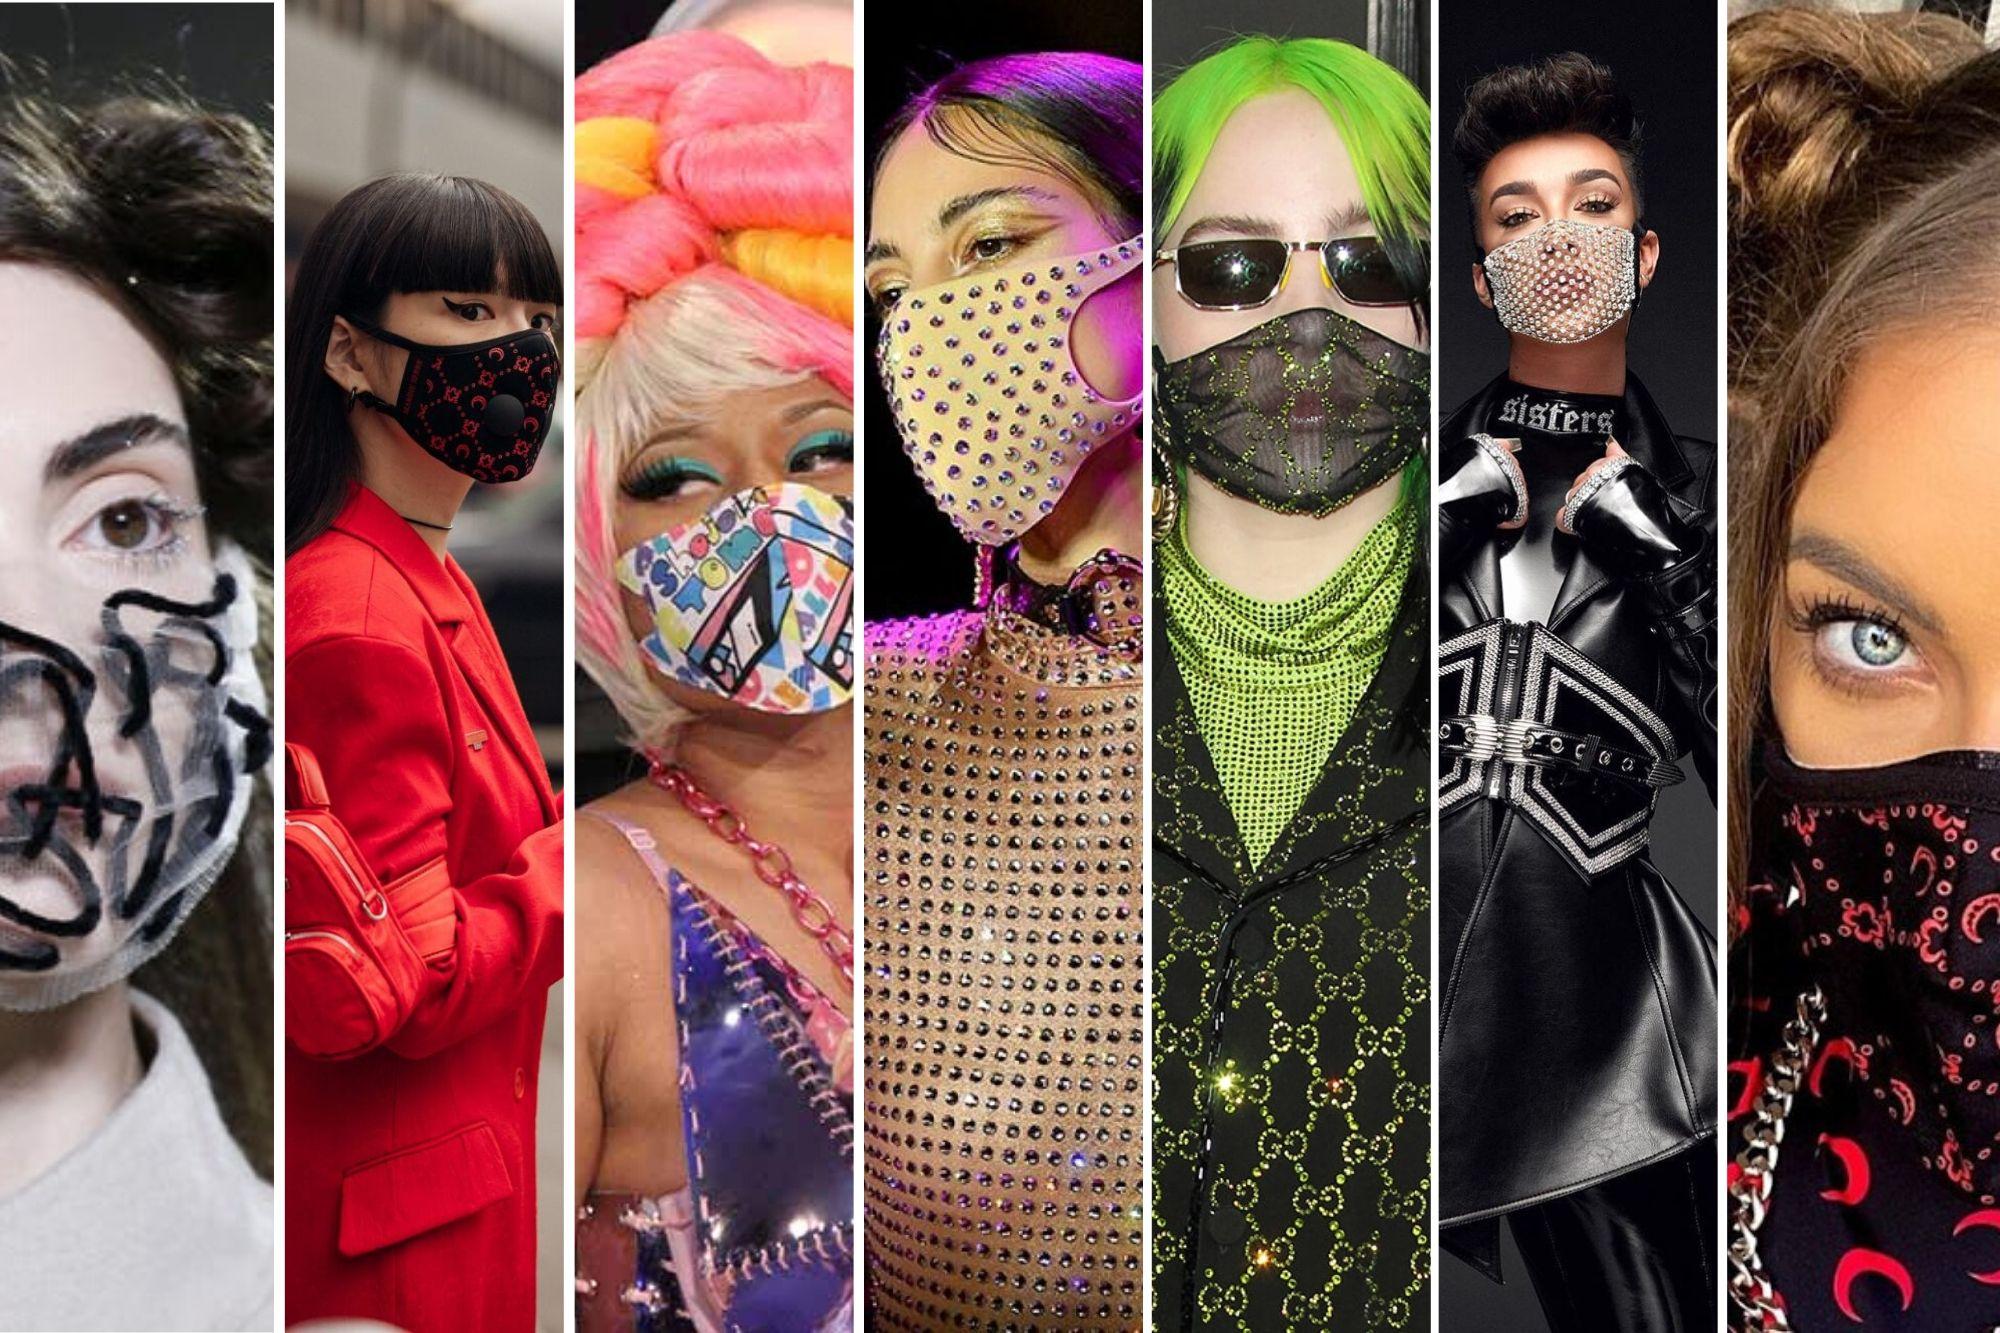 How coronavirus will shape fashion?